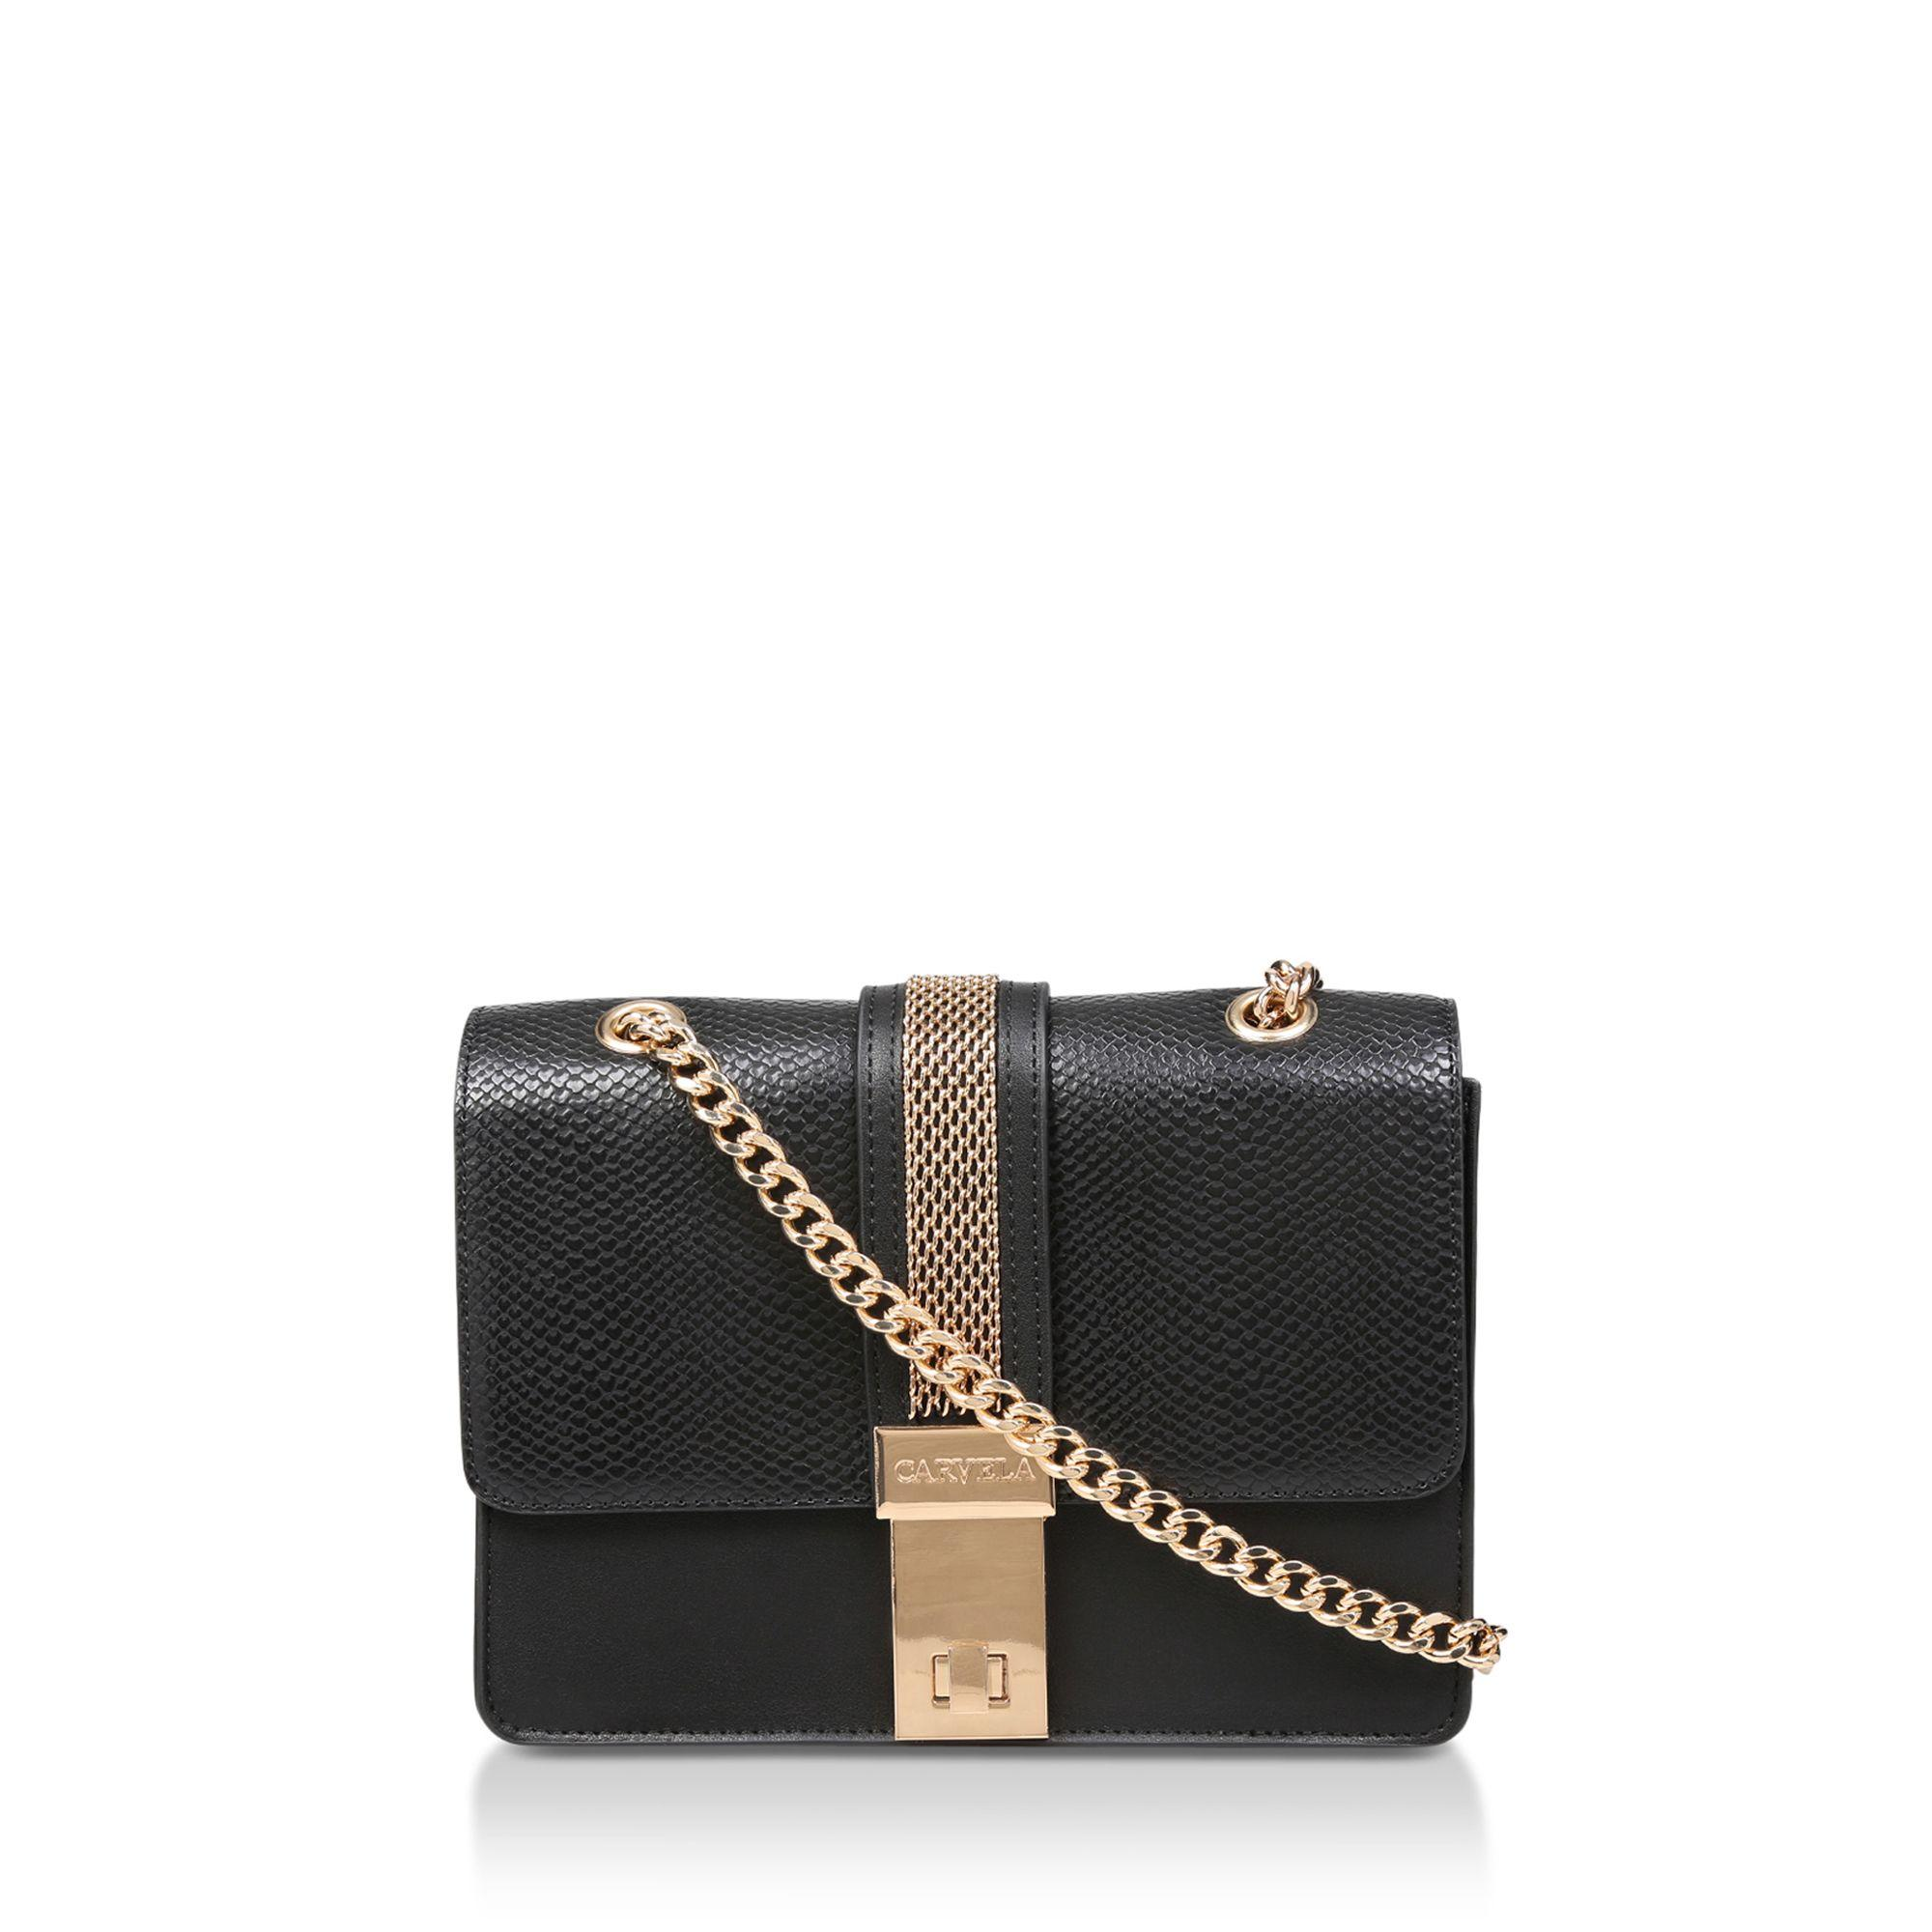 Carvela Kurt Geiger. Women s Black  casey Chain Xbody Bag  Snake Print Cross  Body Bag d55791176b9a5